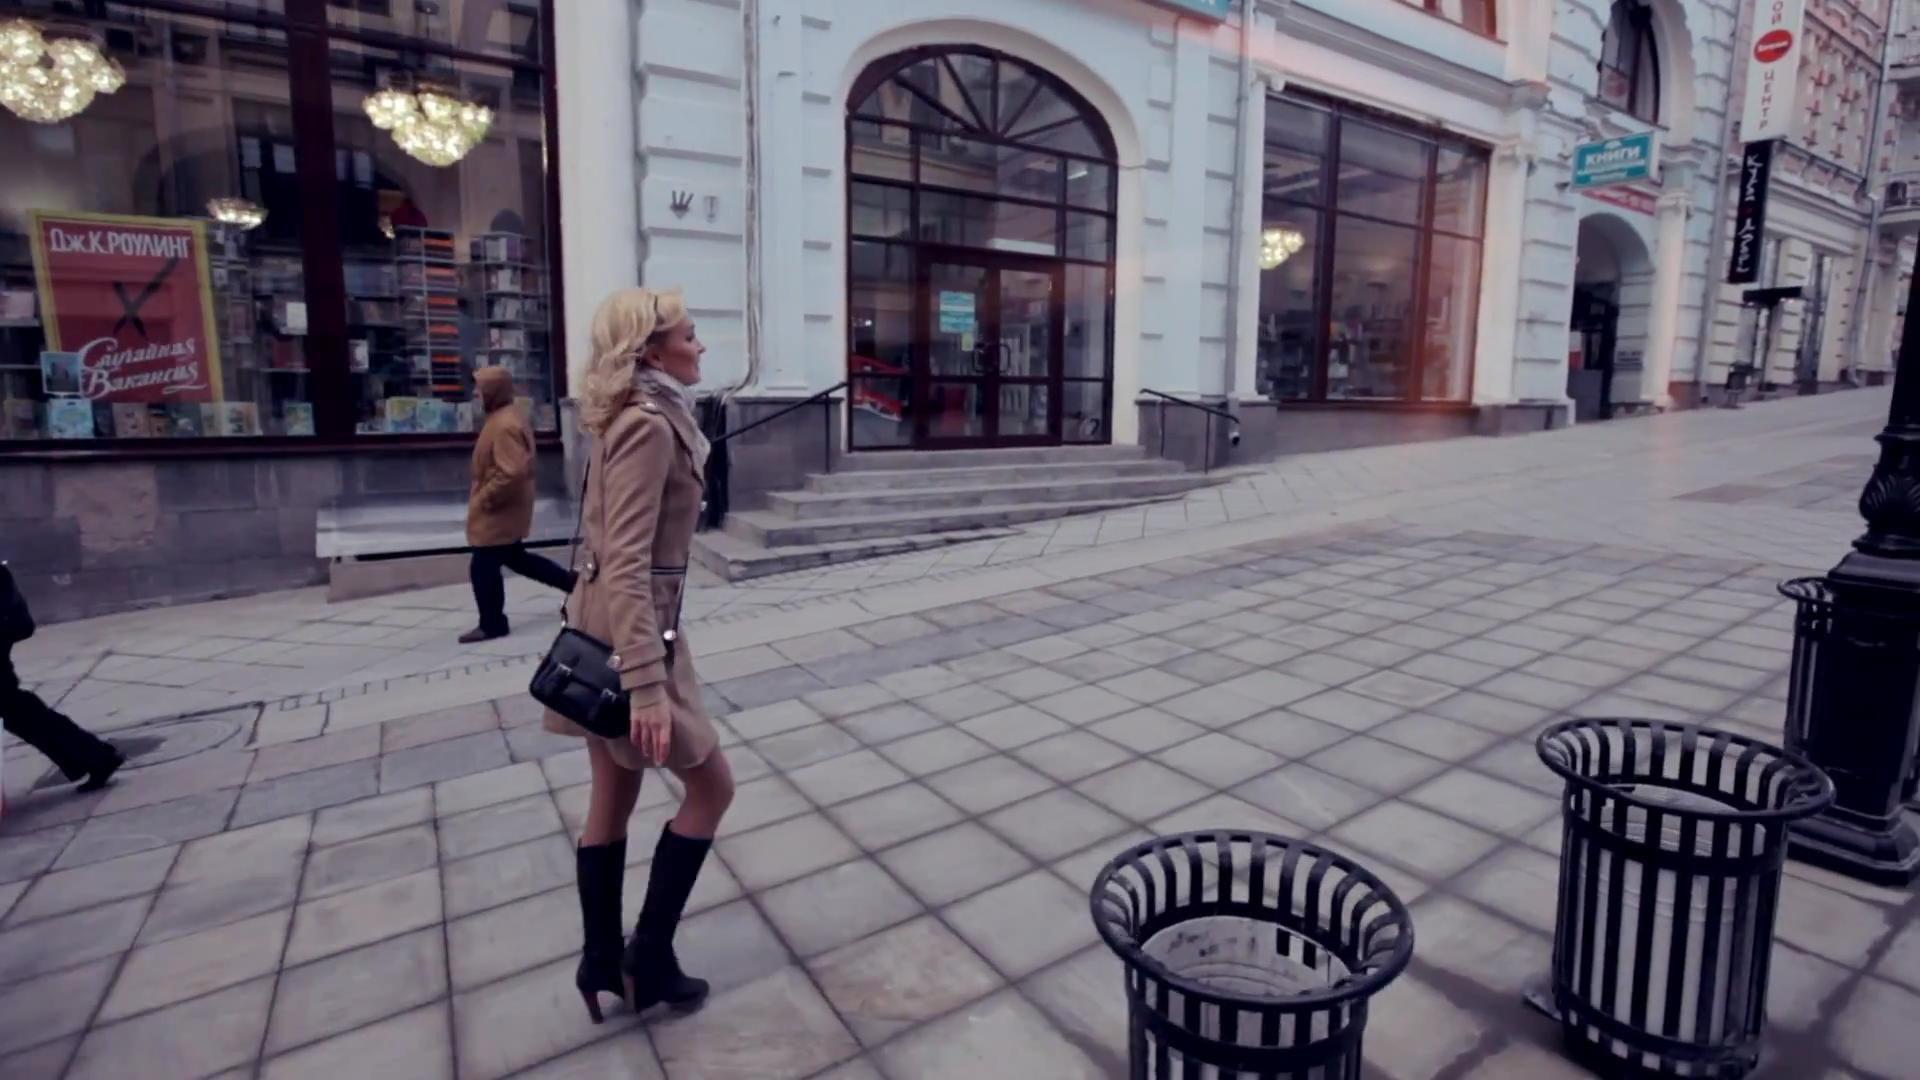 http://i5.imageban.ru/out/2013/05/30/2b94a6a72151f0beb0c37f0df04561fb.jpg